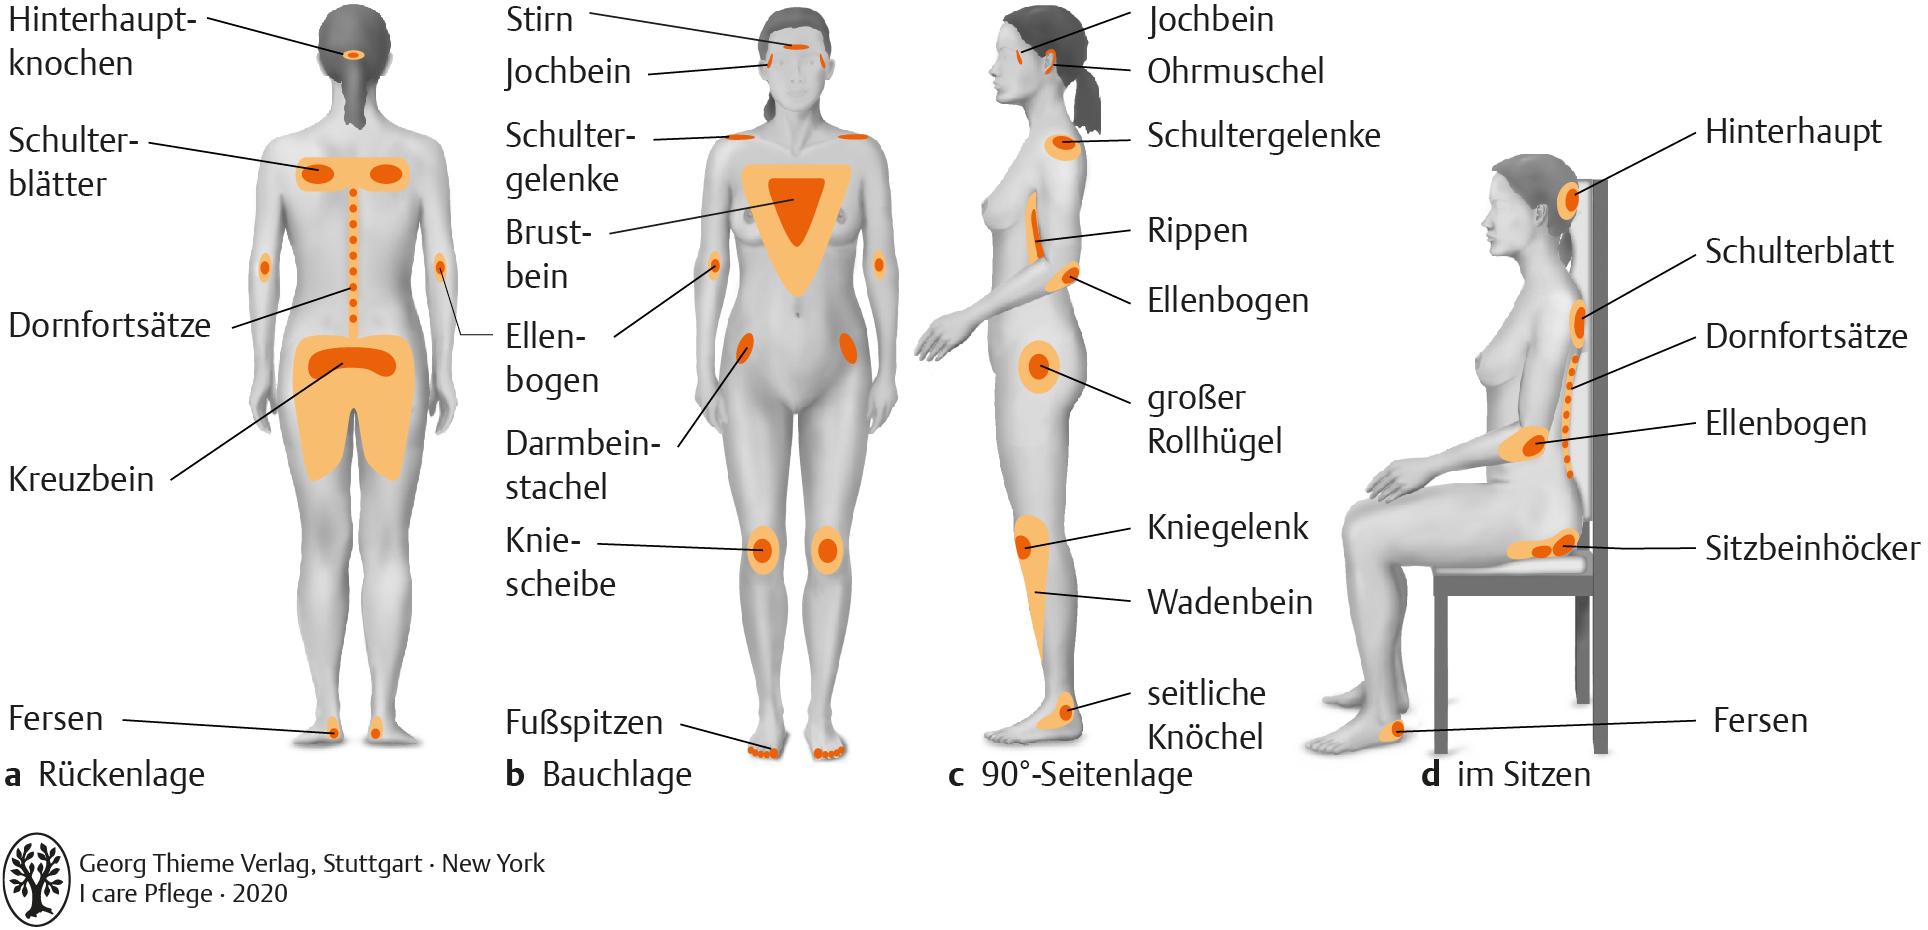 20. Prophylaxen   Pflegepädagogik   Georg Thieme Verlag